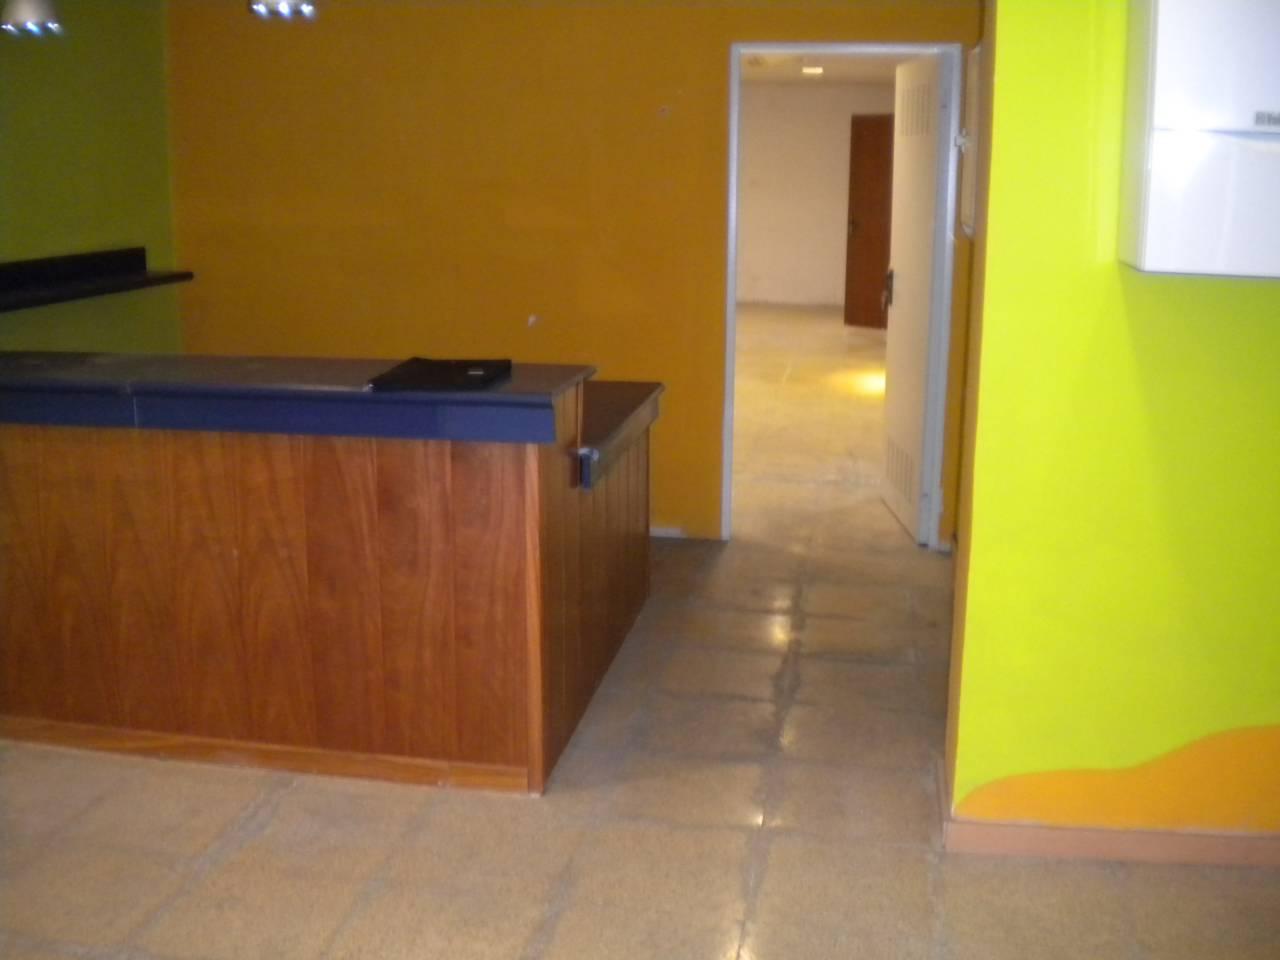 Lloguer Local Comercial  Catalunya. Superf. 80 m²,  1 aseo, accesibilidad, escaparate, planta baja,